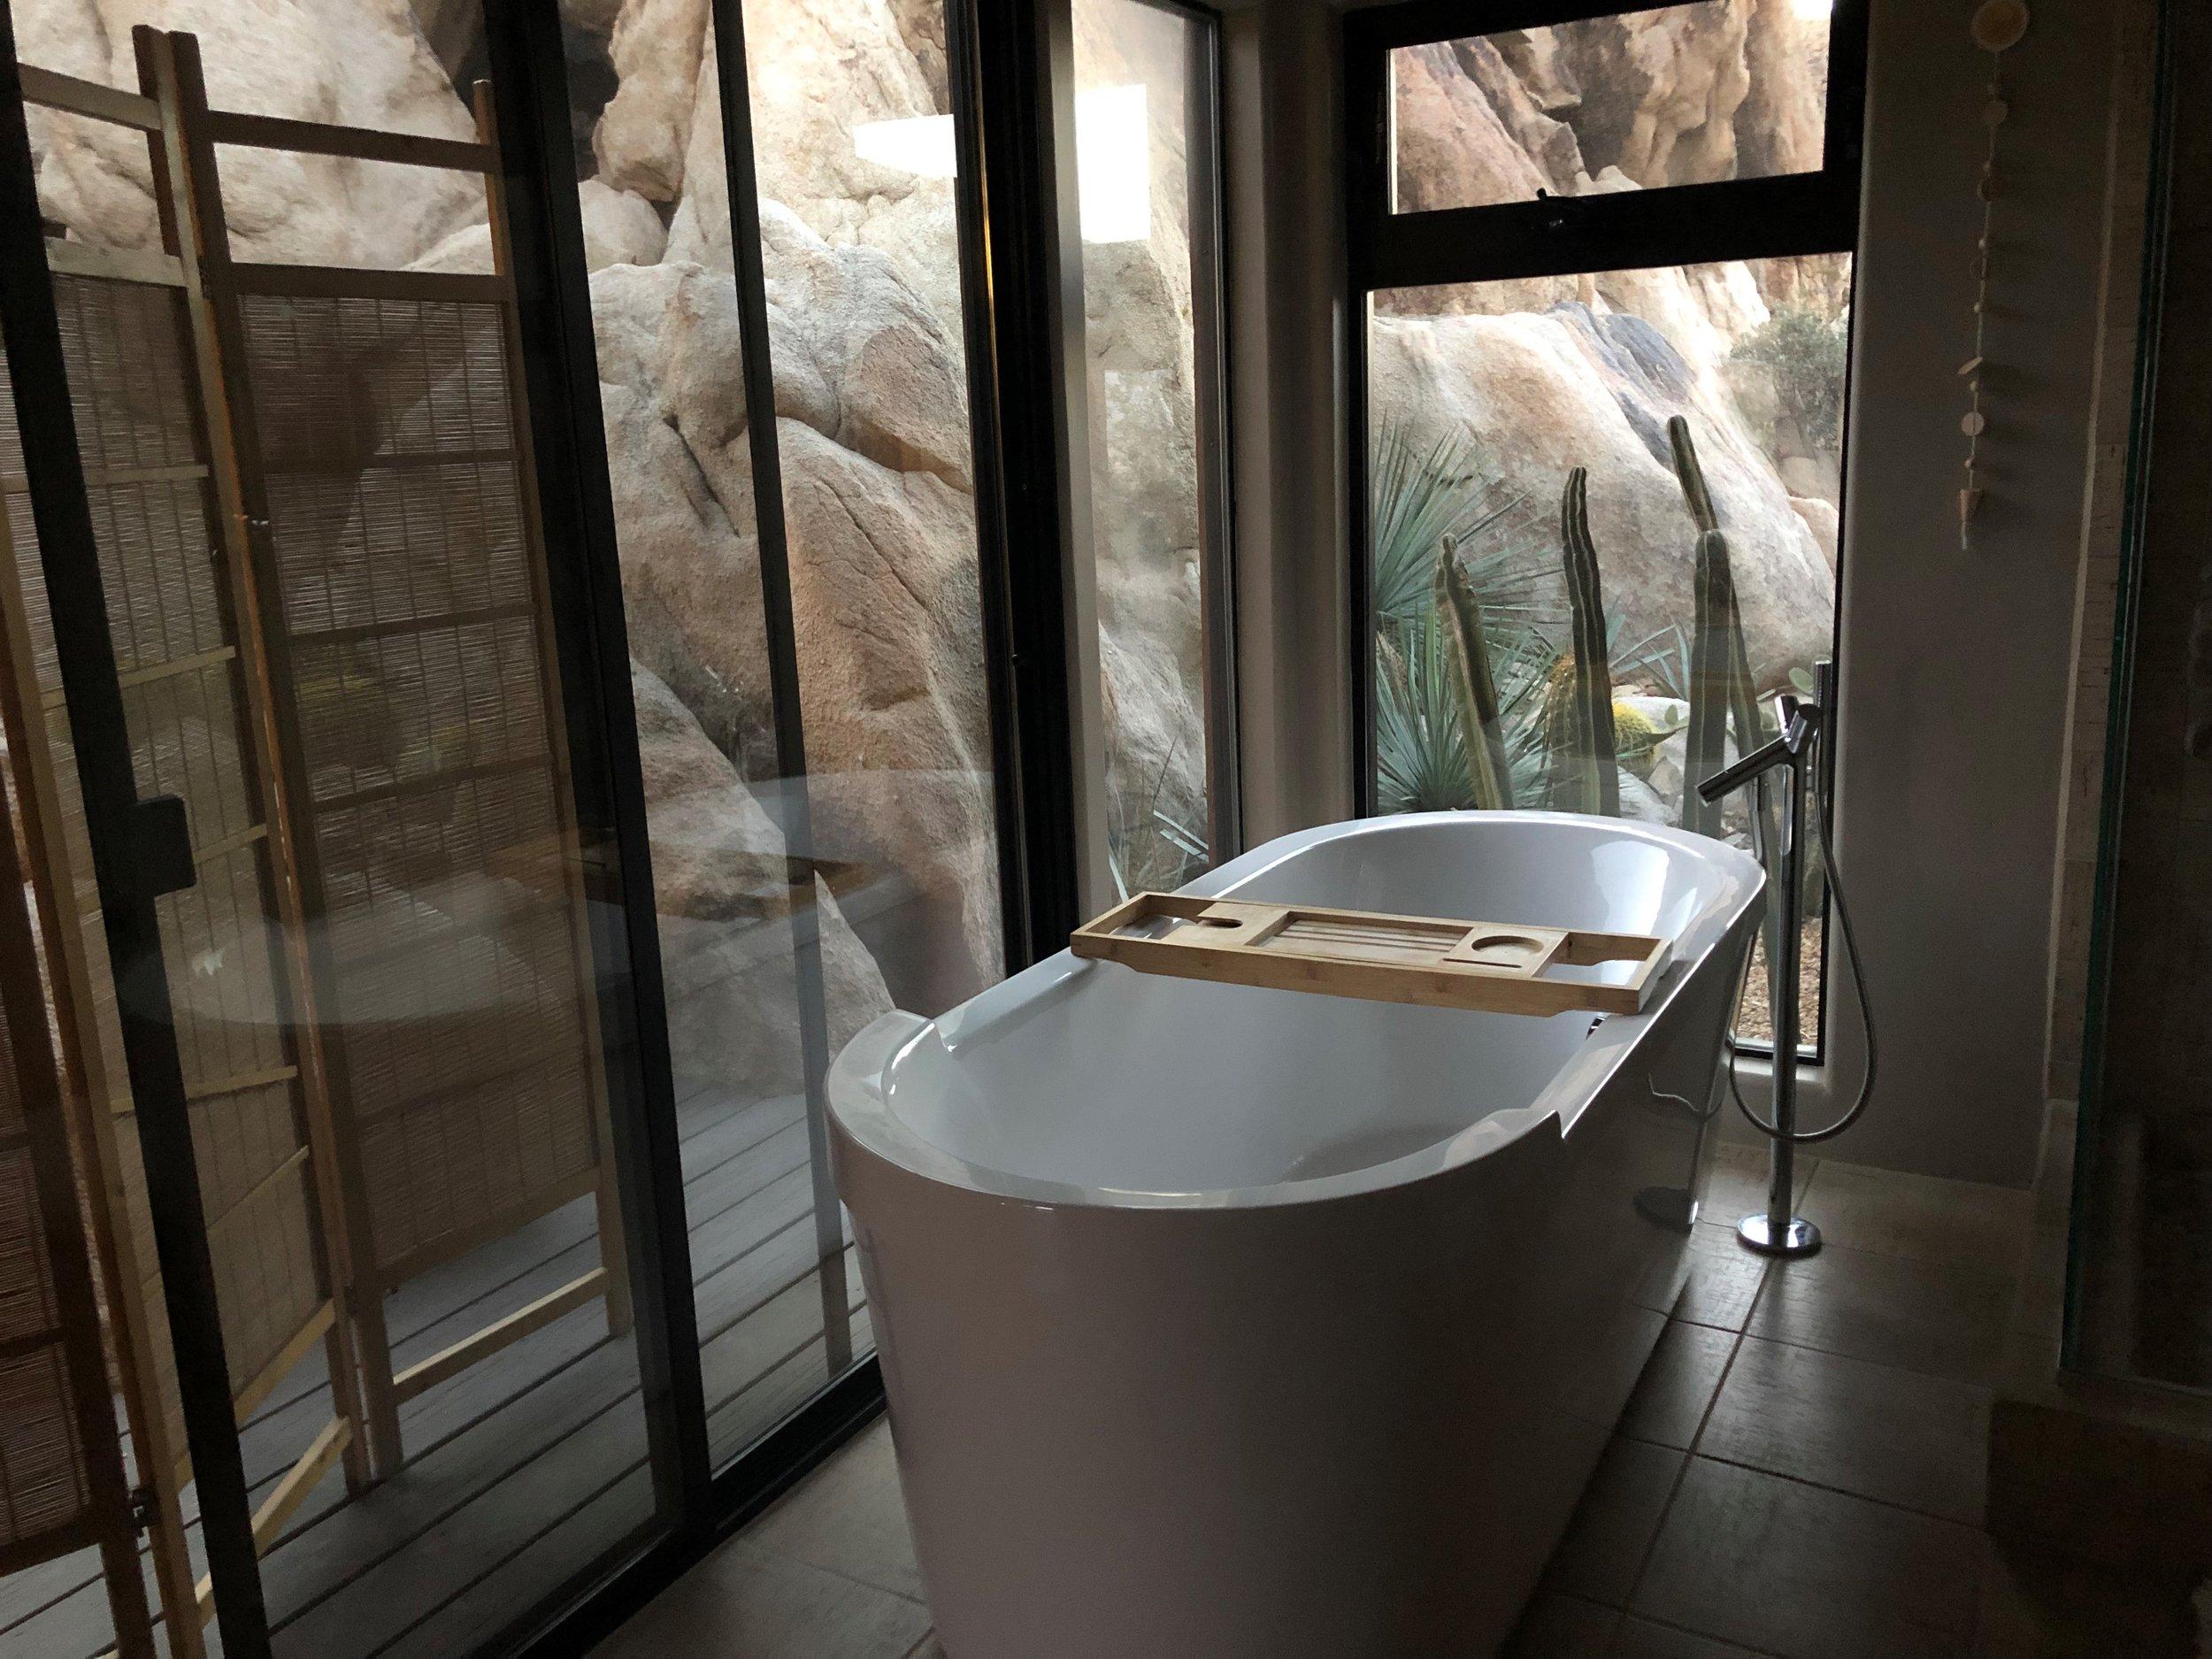 bathtubjt.jpg